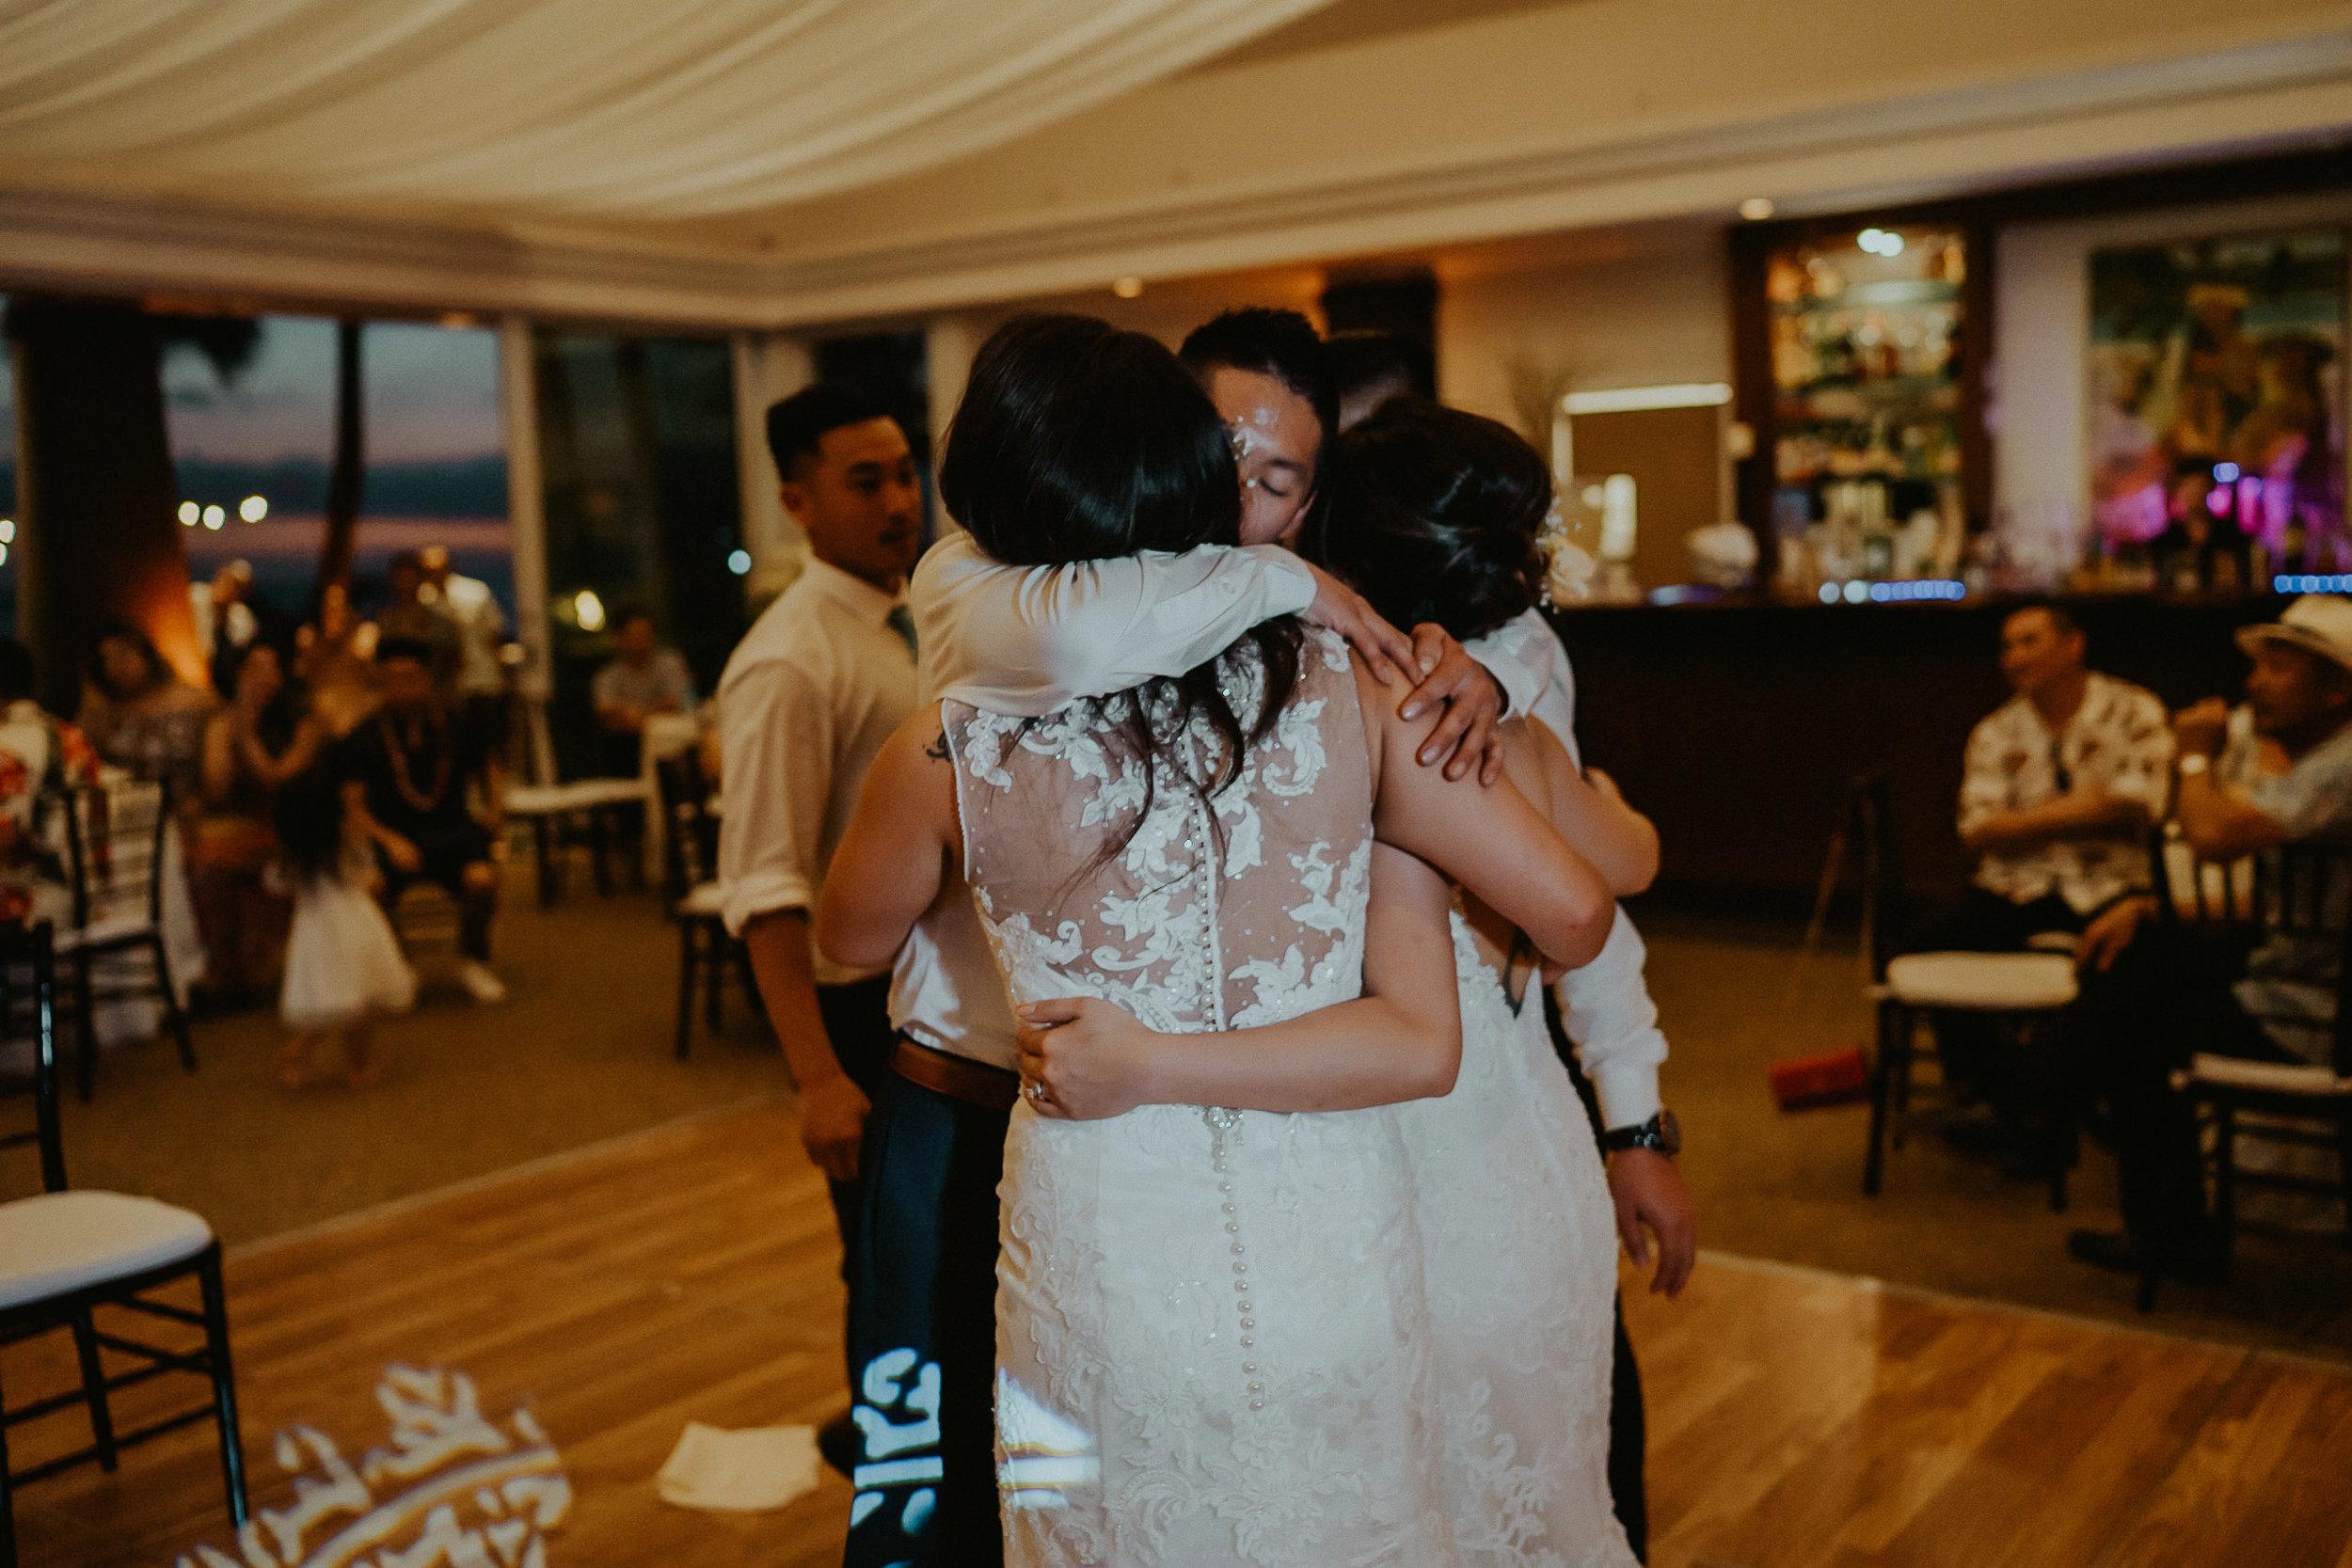 Maui_Destination_wedding_Alfred_Tang-87.jpg